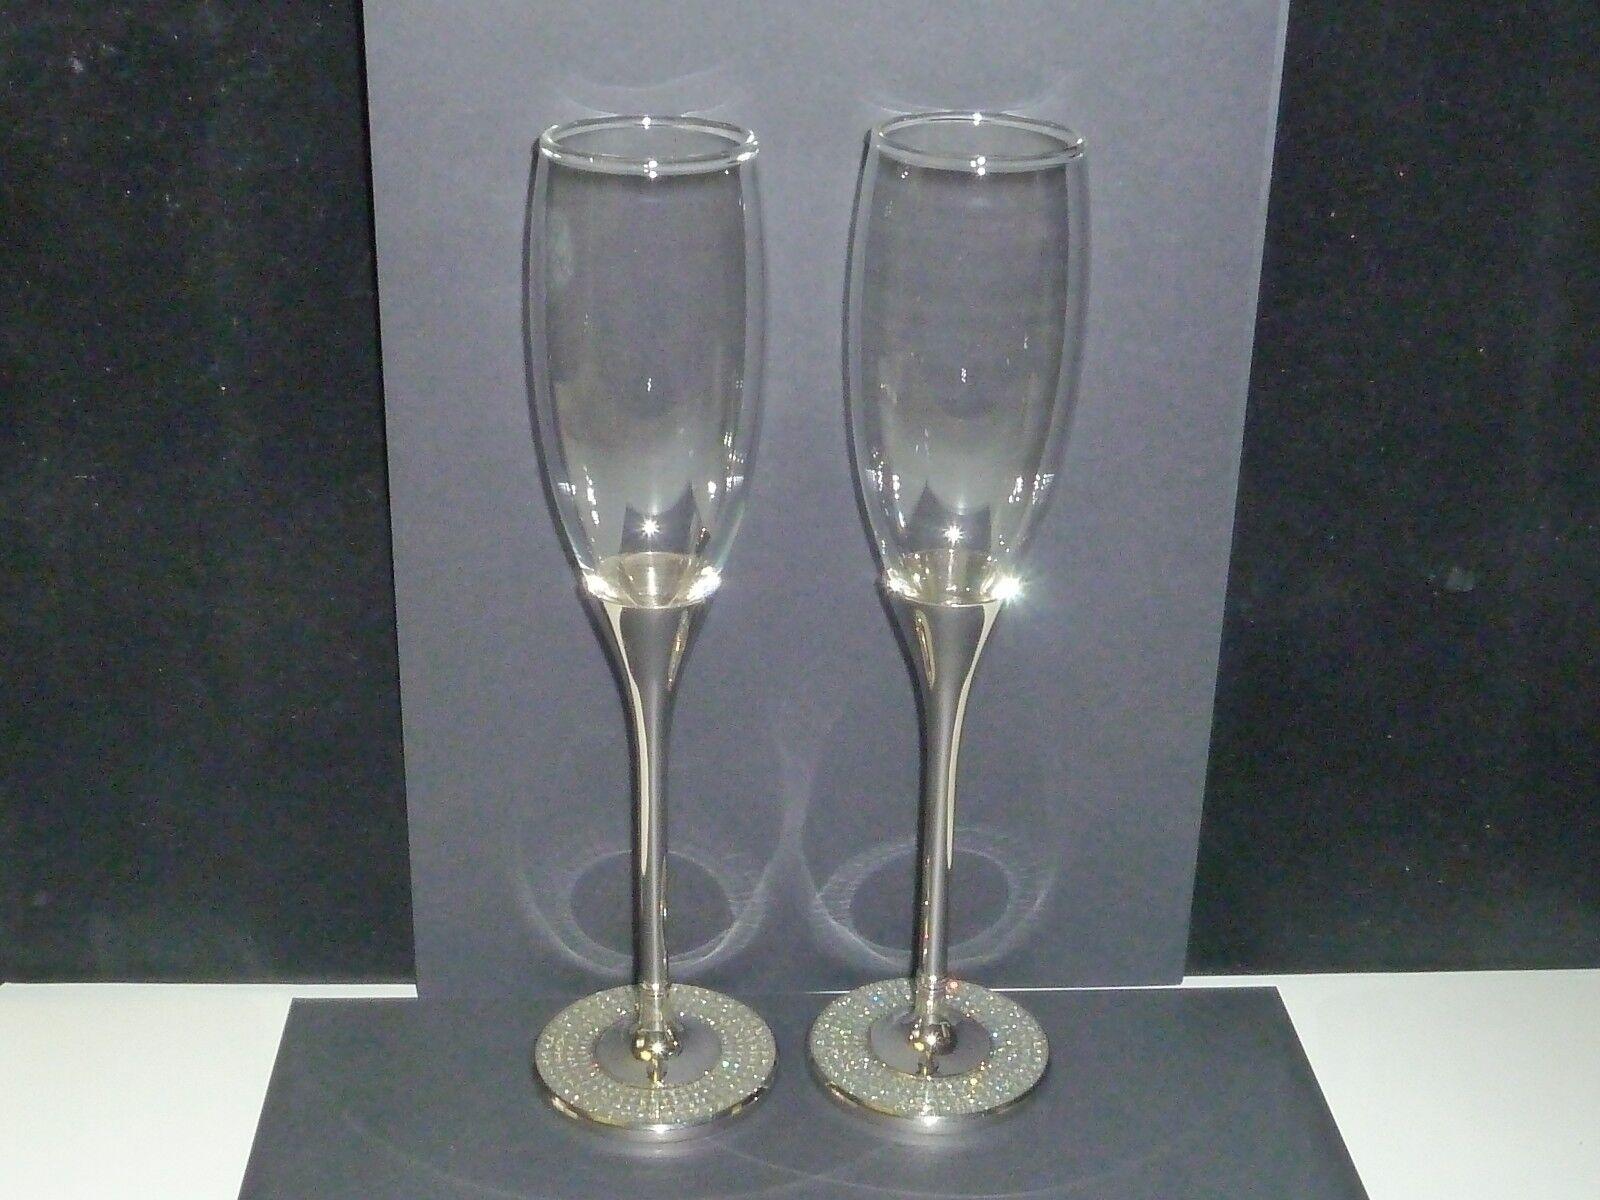 New in Box Glitter Galore Toasting Flute Glasses